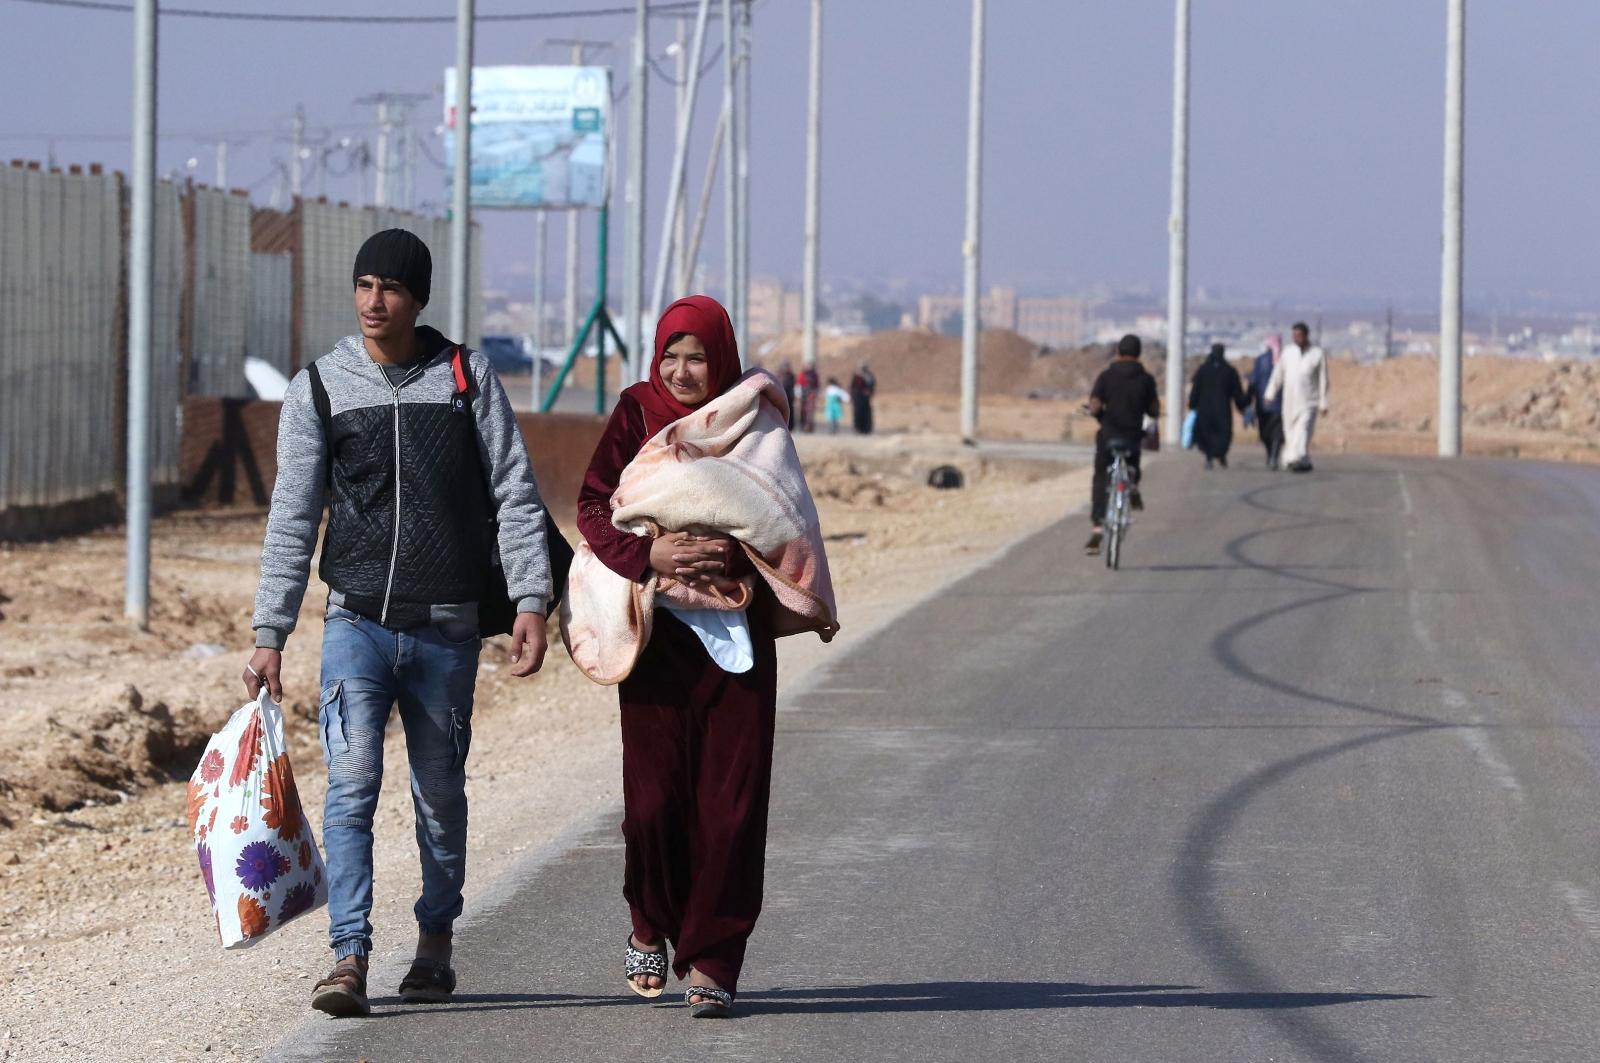 Syrian refugees inside the Jordanian border